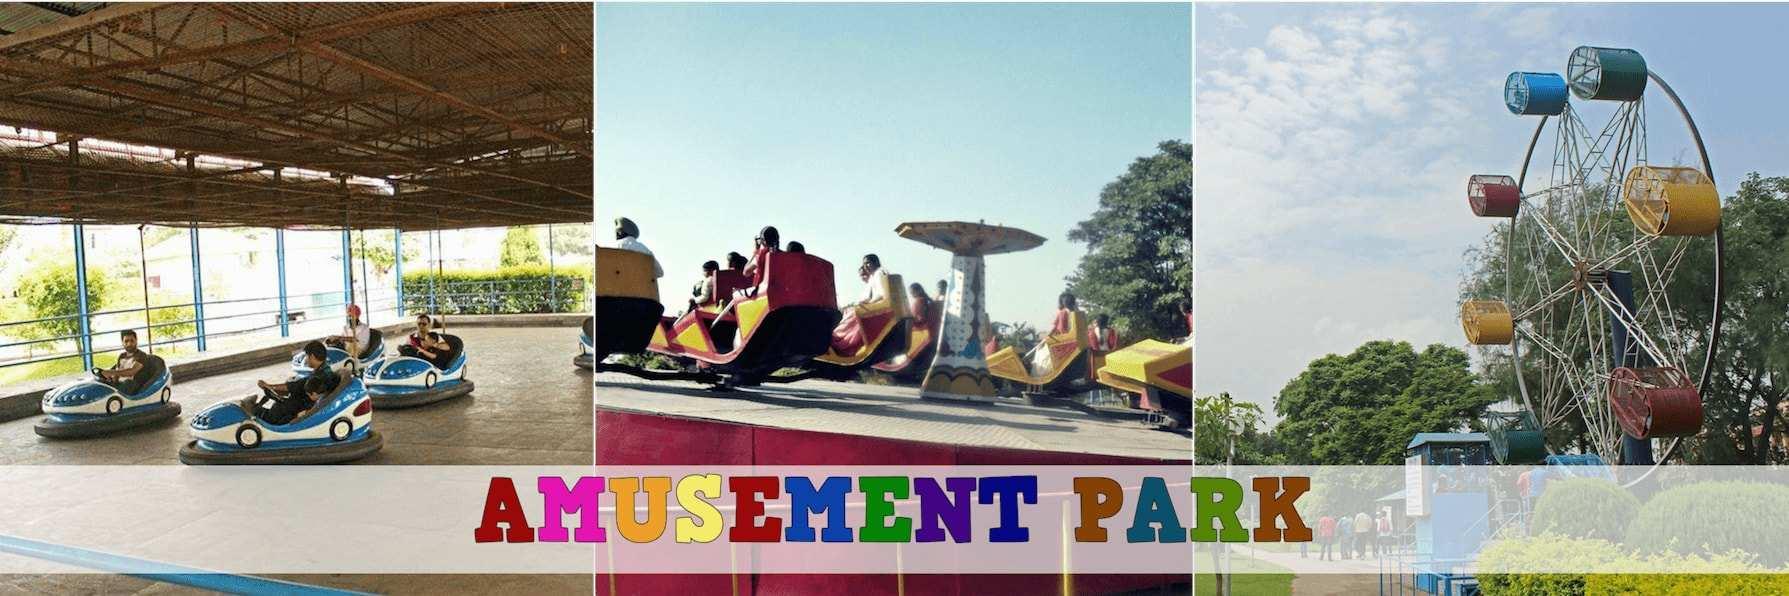 Amusement-park-Funcity-Chandigarh.